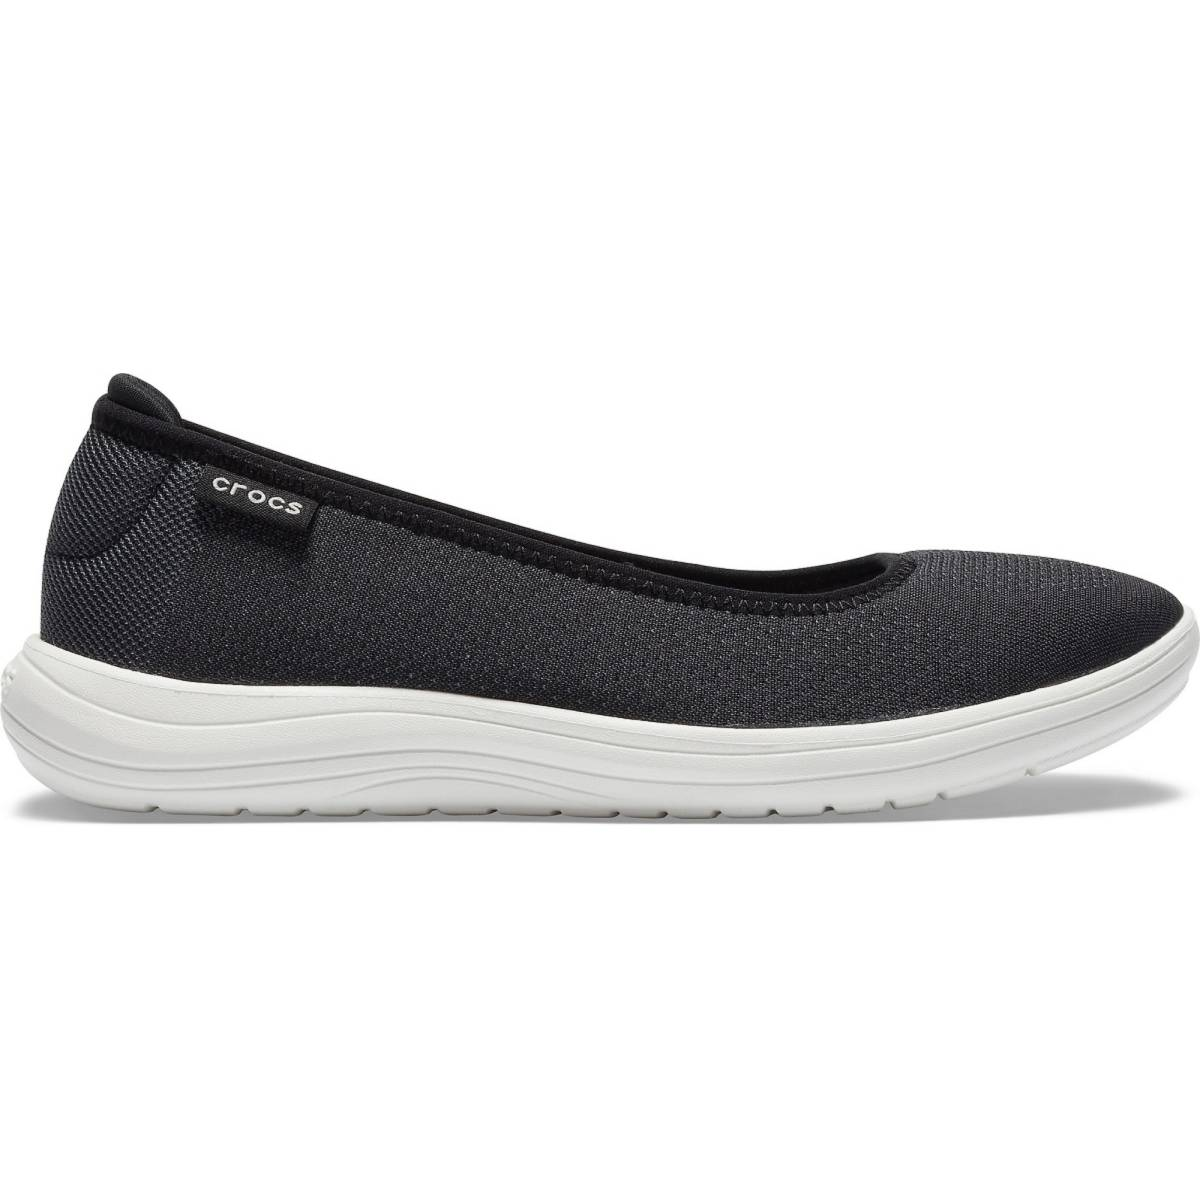 Crocs Reviva Flat W - Siyah/Beyaz